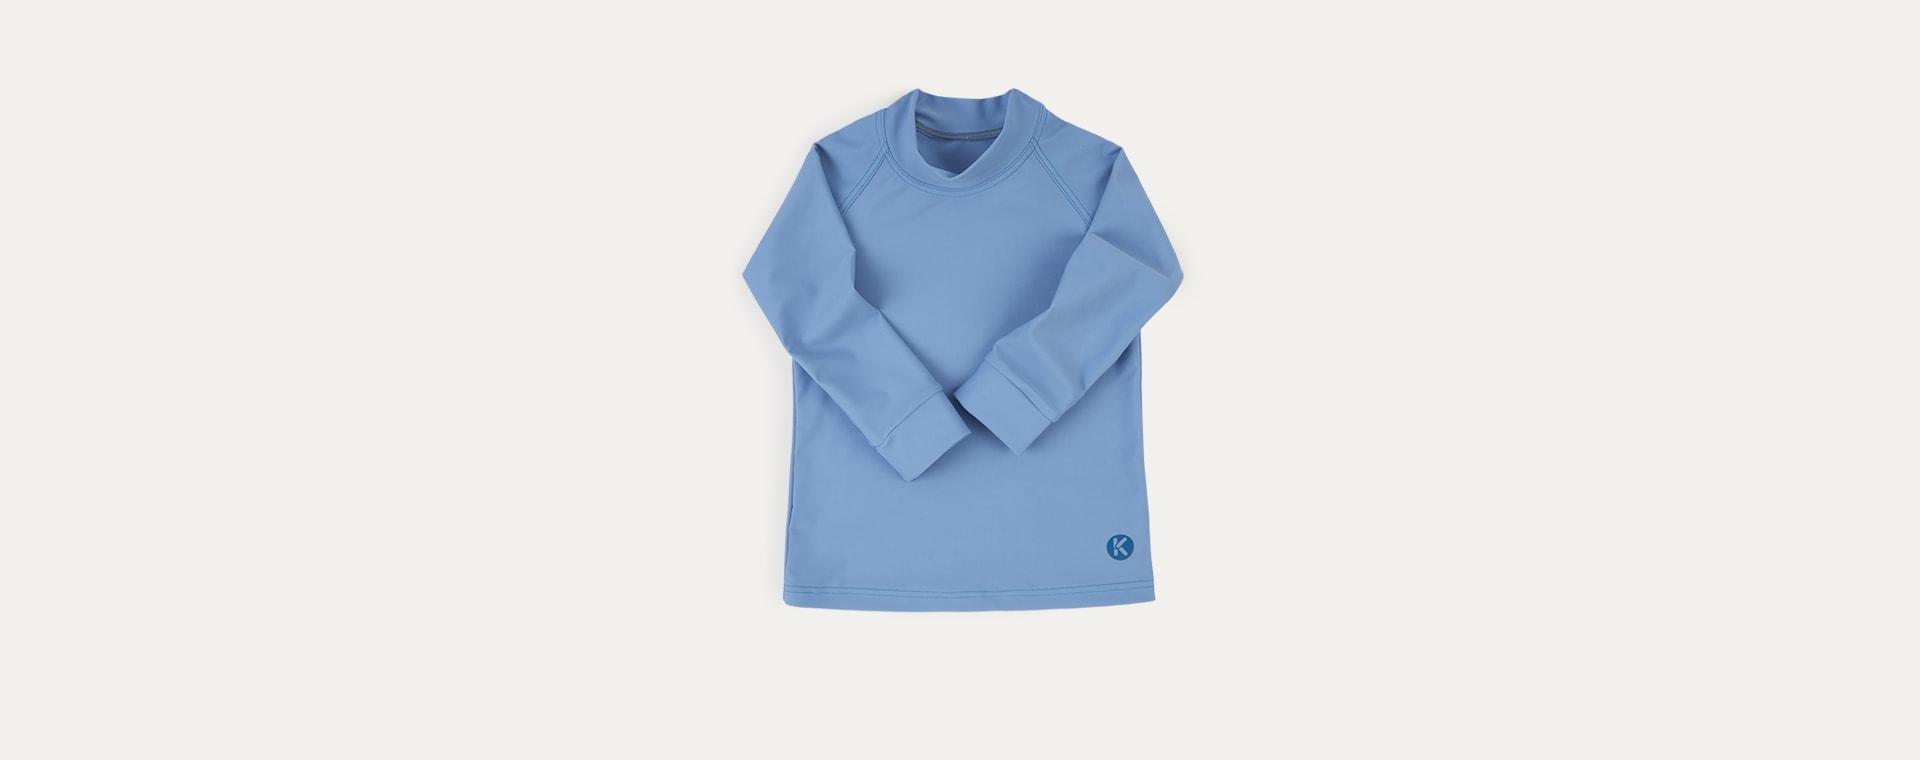 Light Blue KIDLY Label Recycled Rash Vest